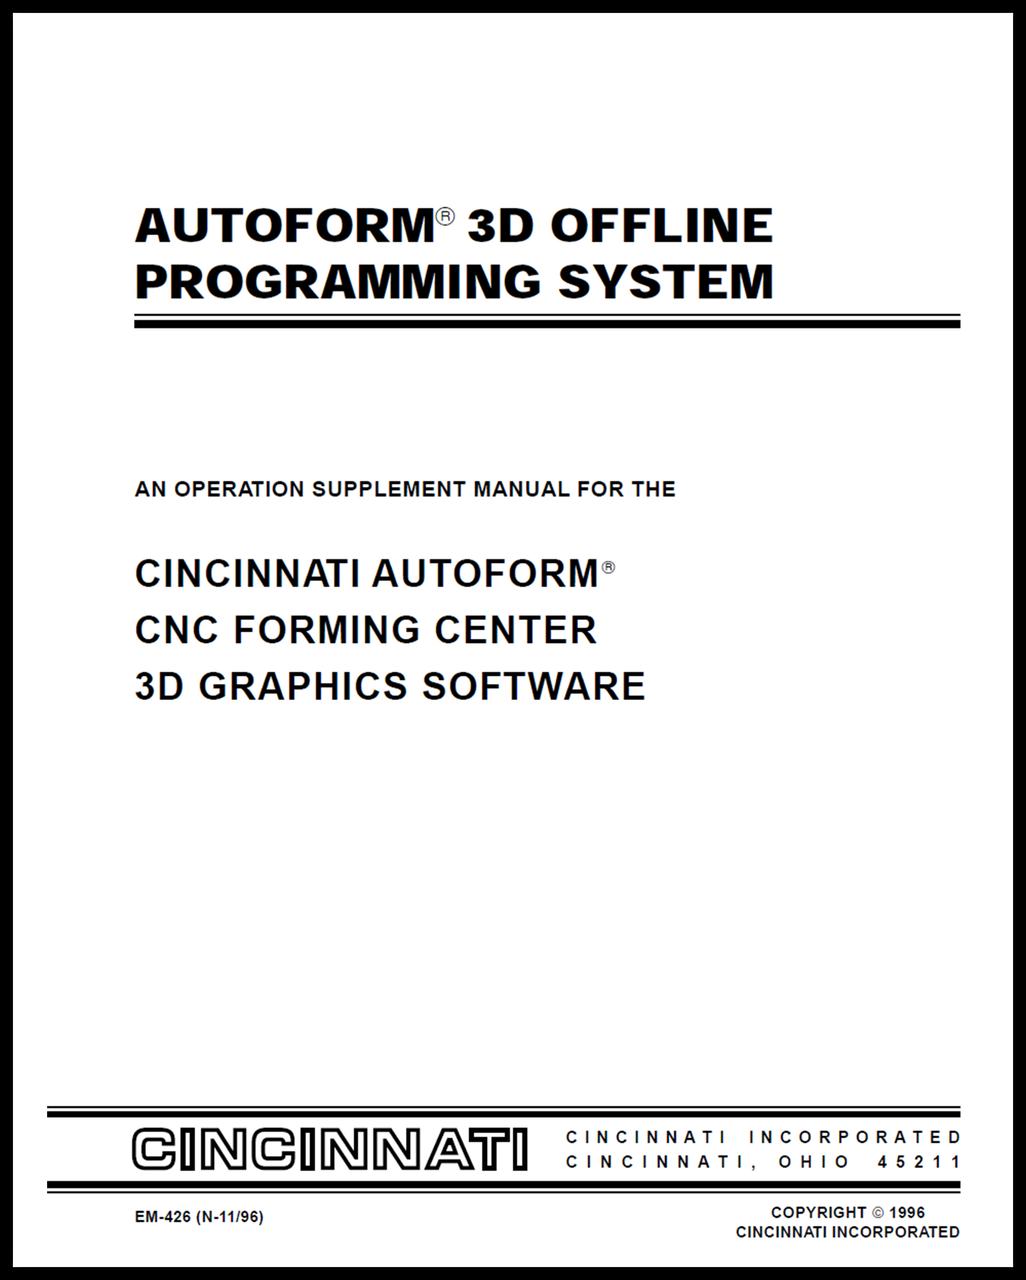 EM-426 (N-11-96) AUTOFORM 3D Offline Programming System - An Operation Supplement Manual for AUTOFORM CNC Forming Center 3D Graphics Software